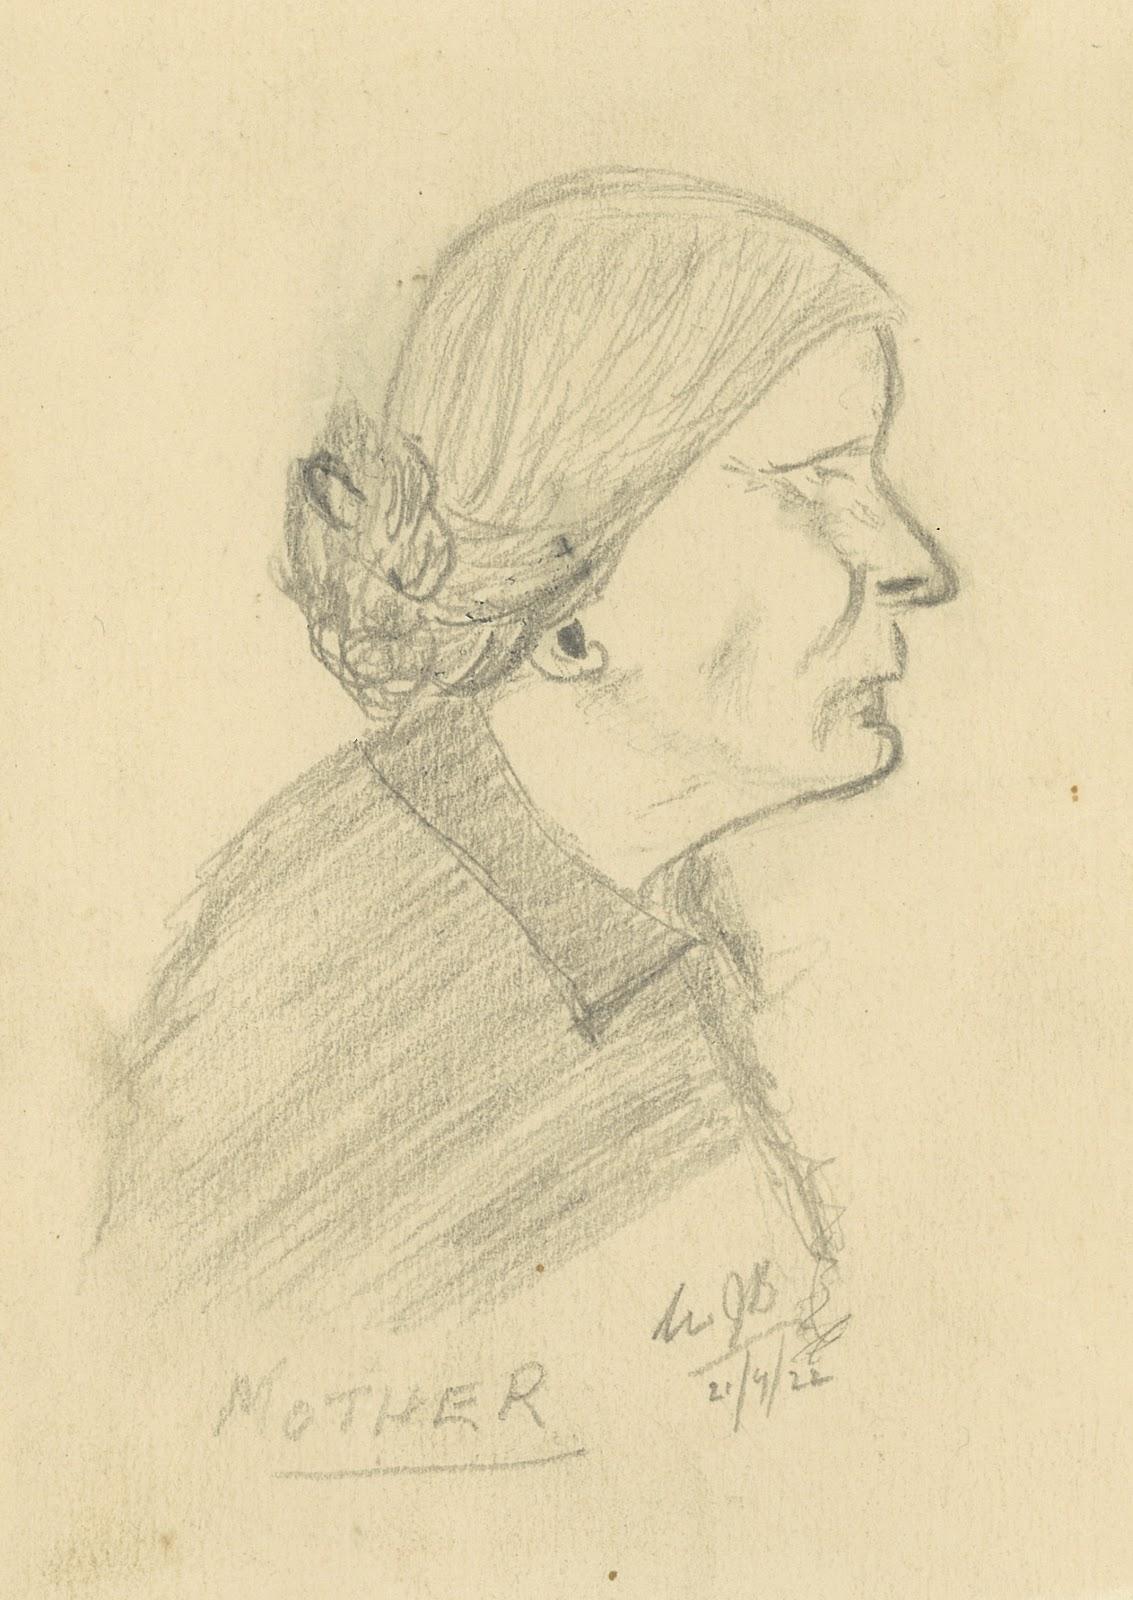 brigid sketch 2.jpg